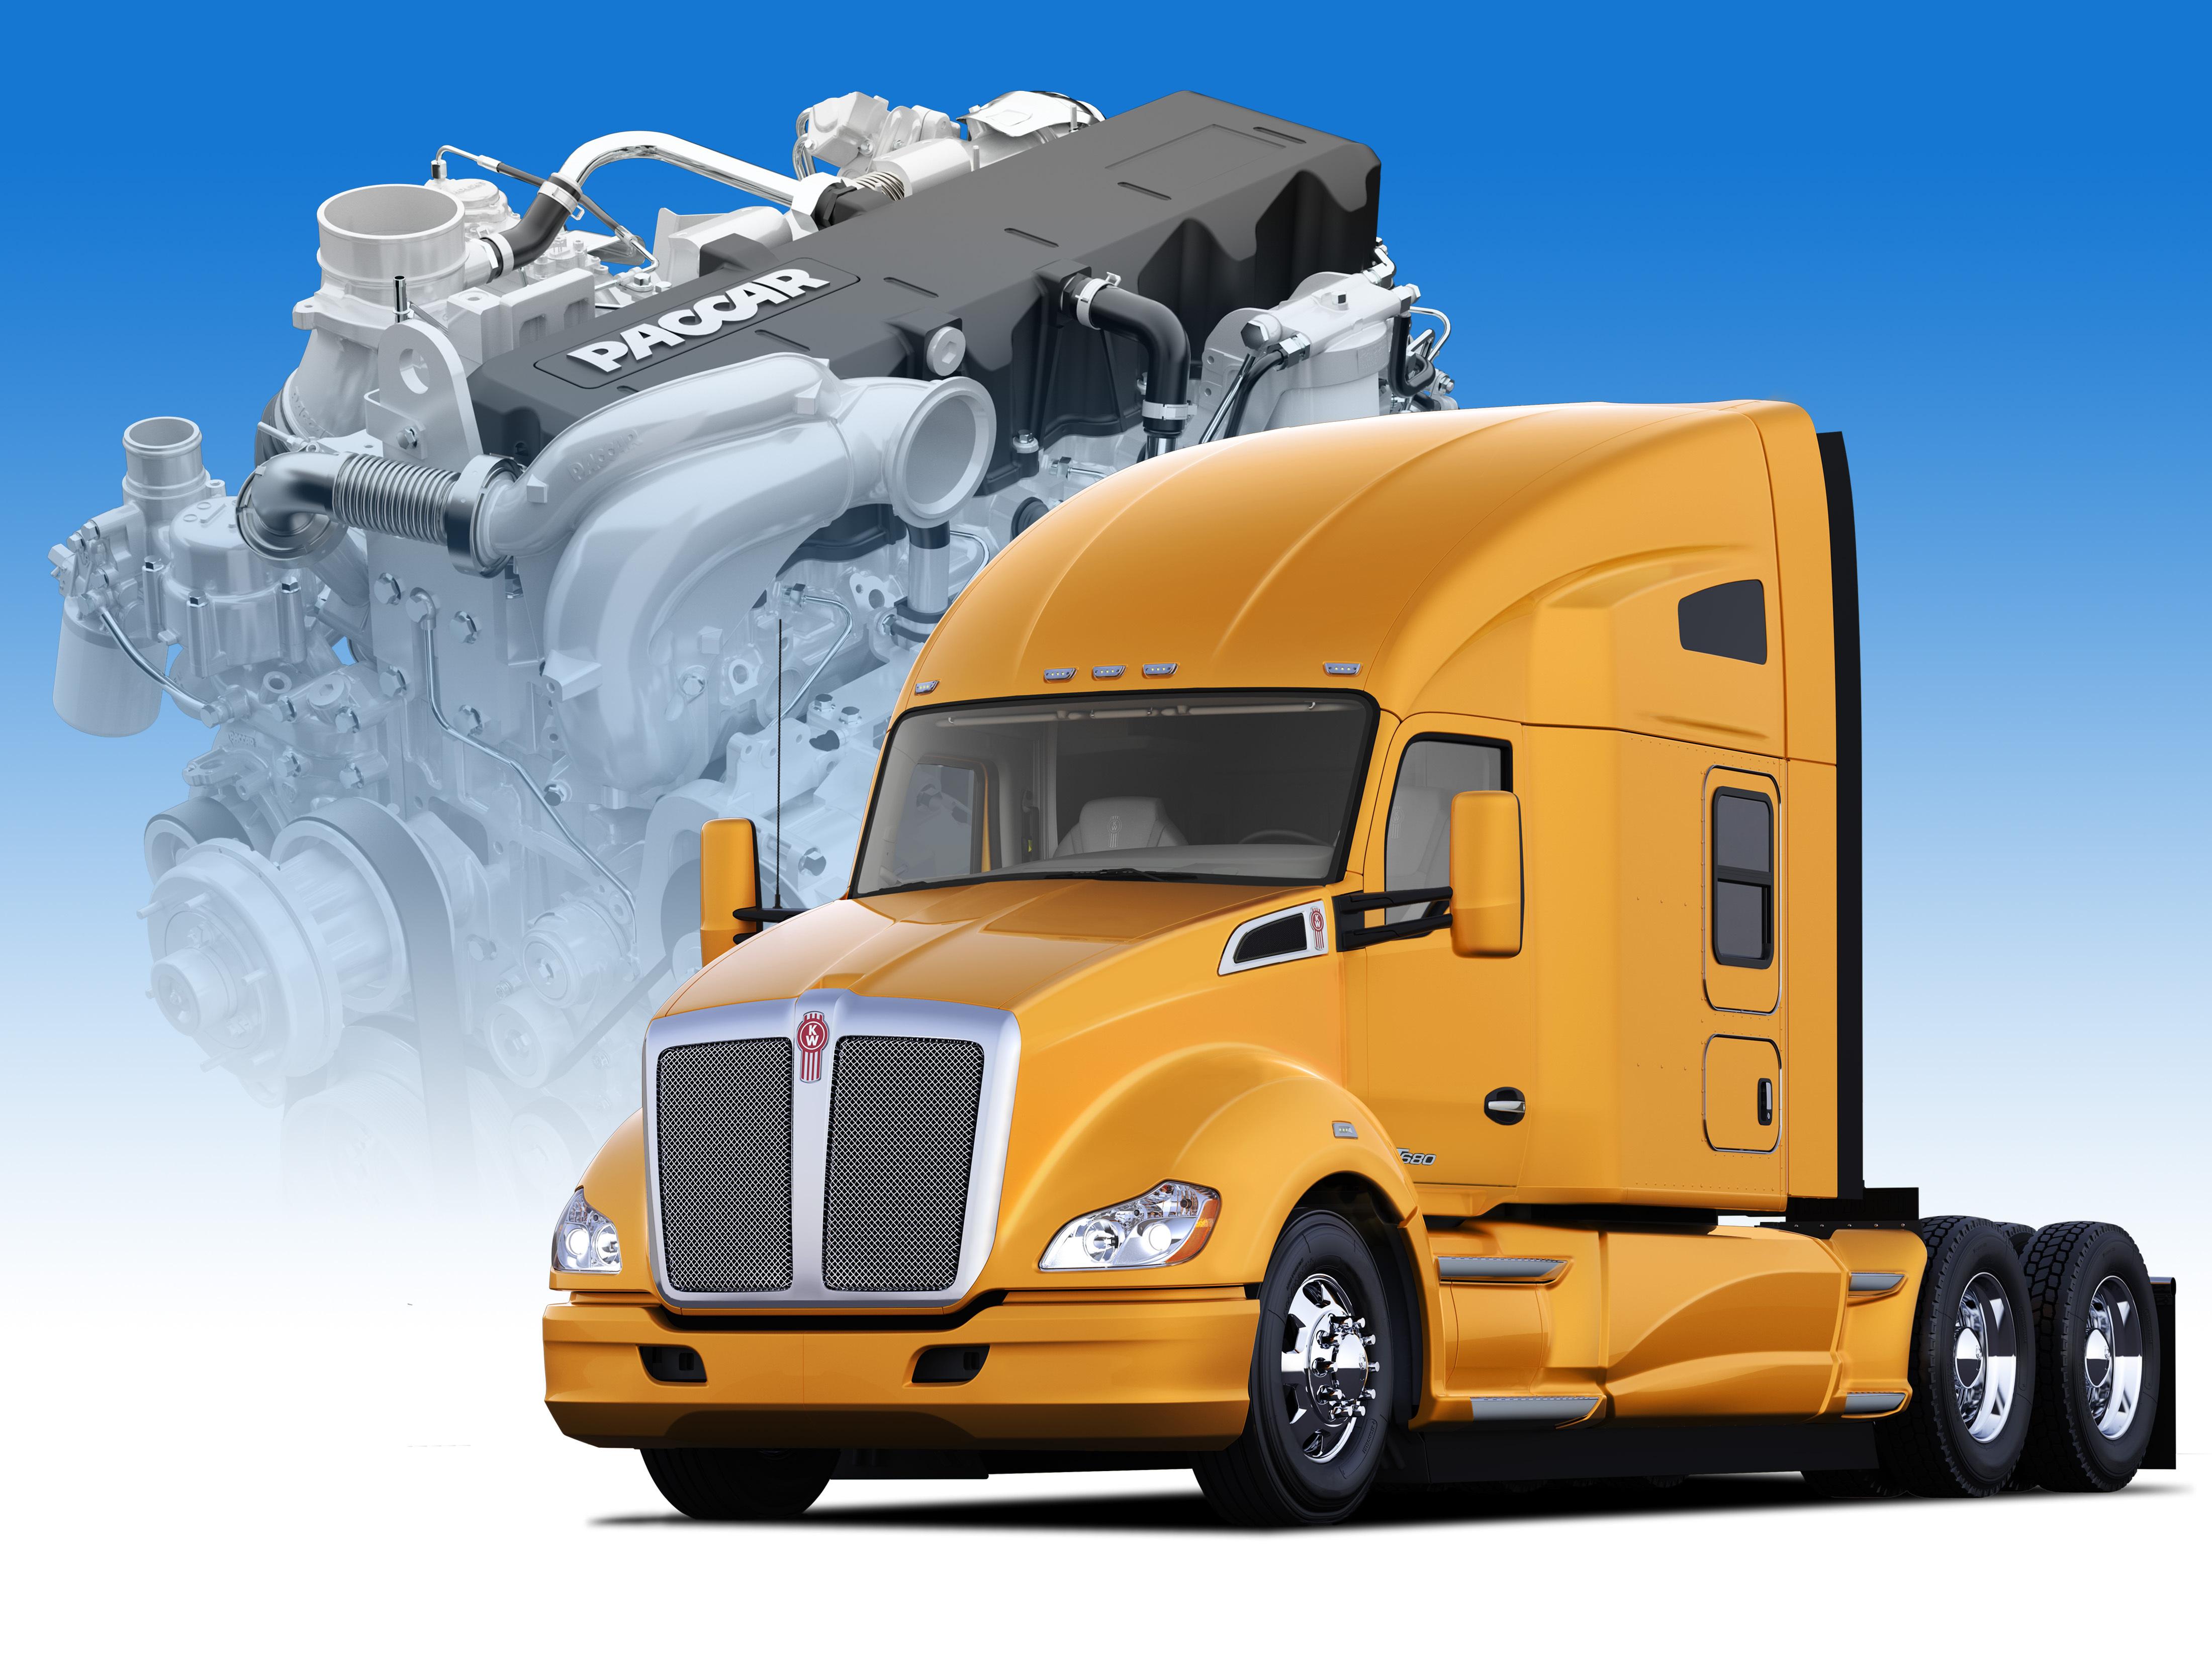 Engine Diagram For Kenworth Truck Predator Wire Harness Gm Radio – Kenworth Truck Wiring Diagrams